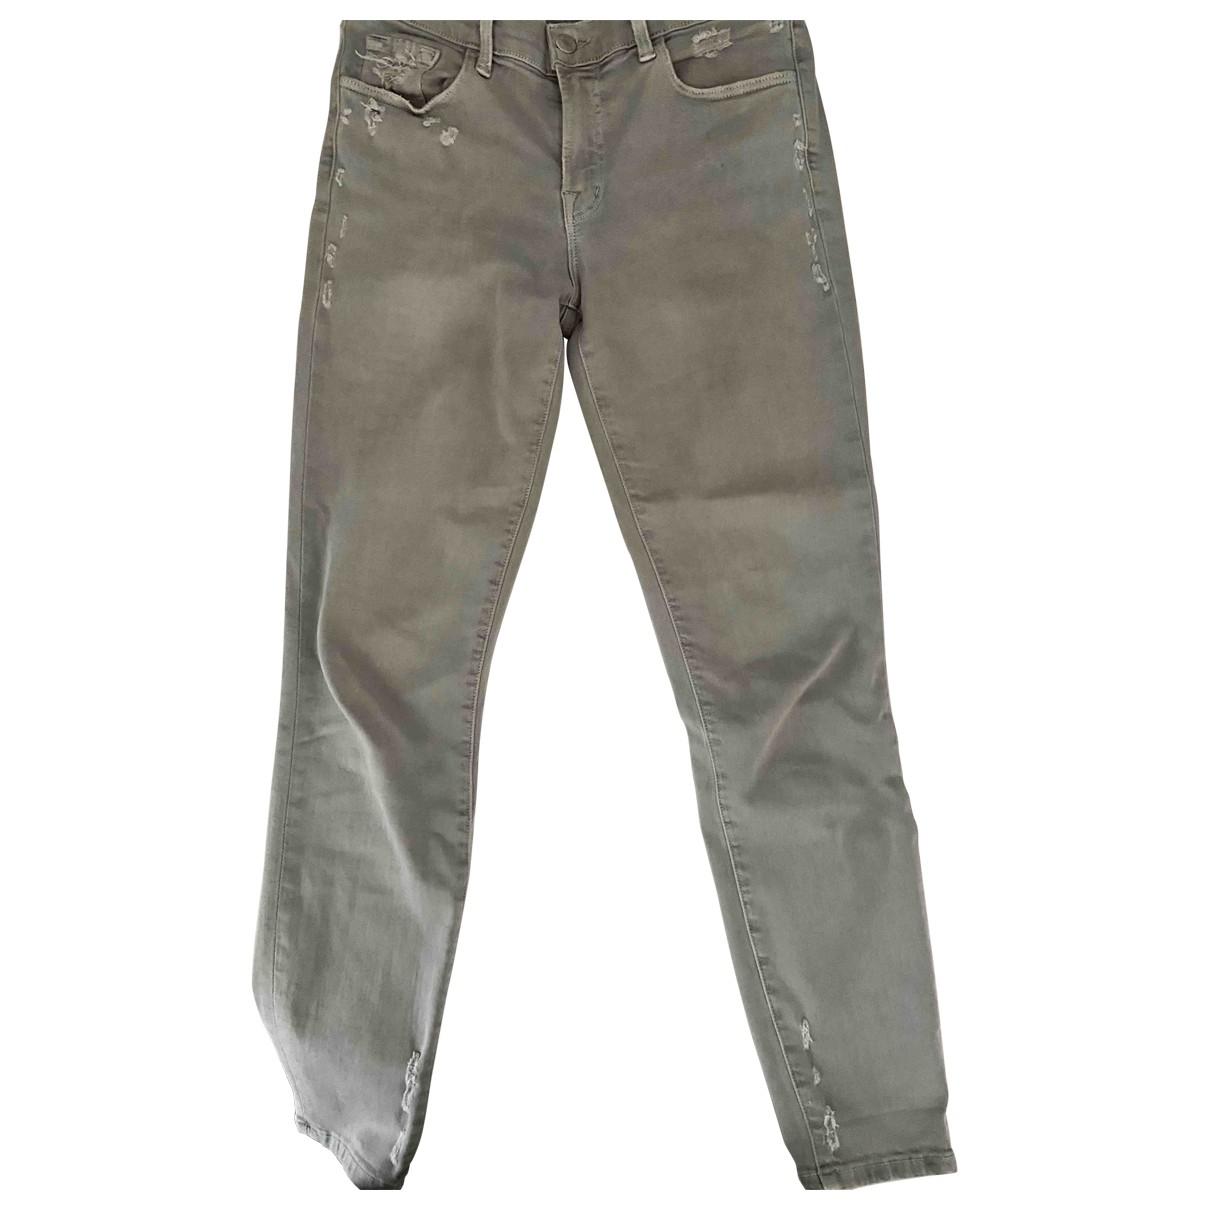 J Brand \N Grey Denim - Jeans Jeans for Women 27 US